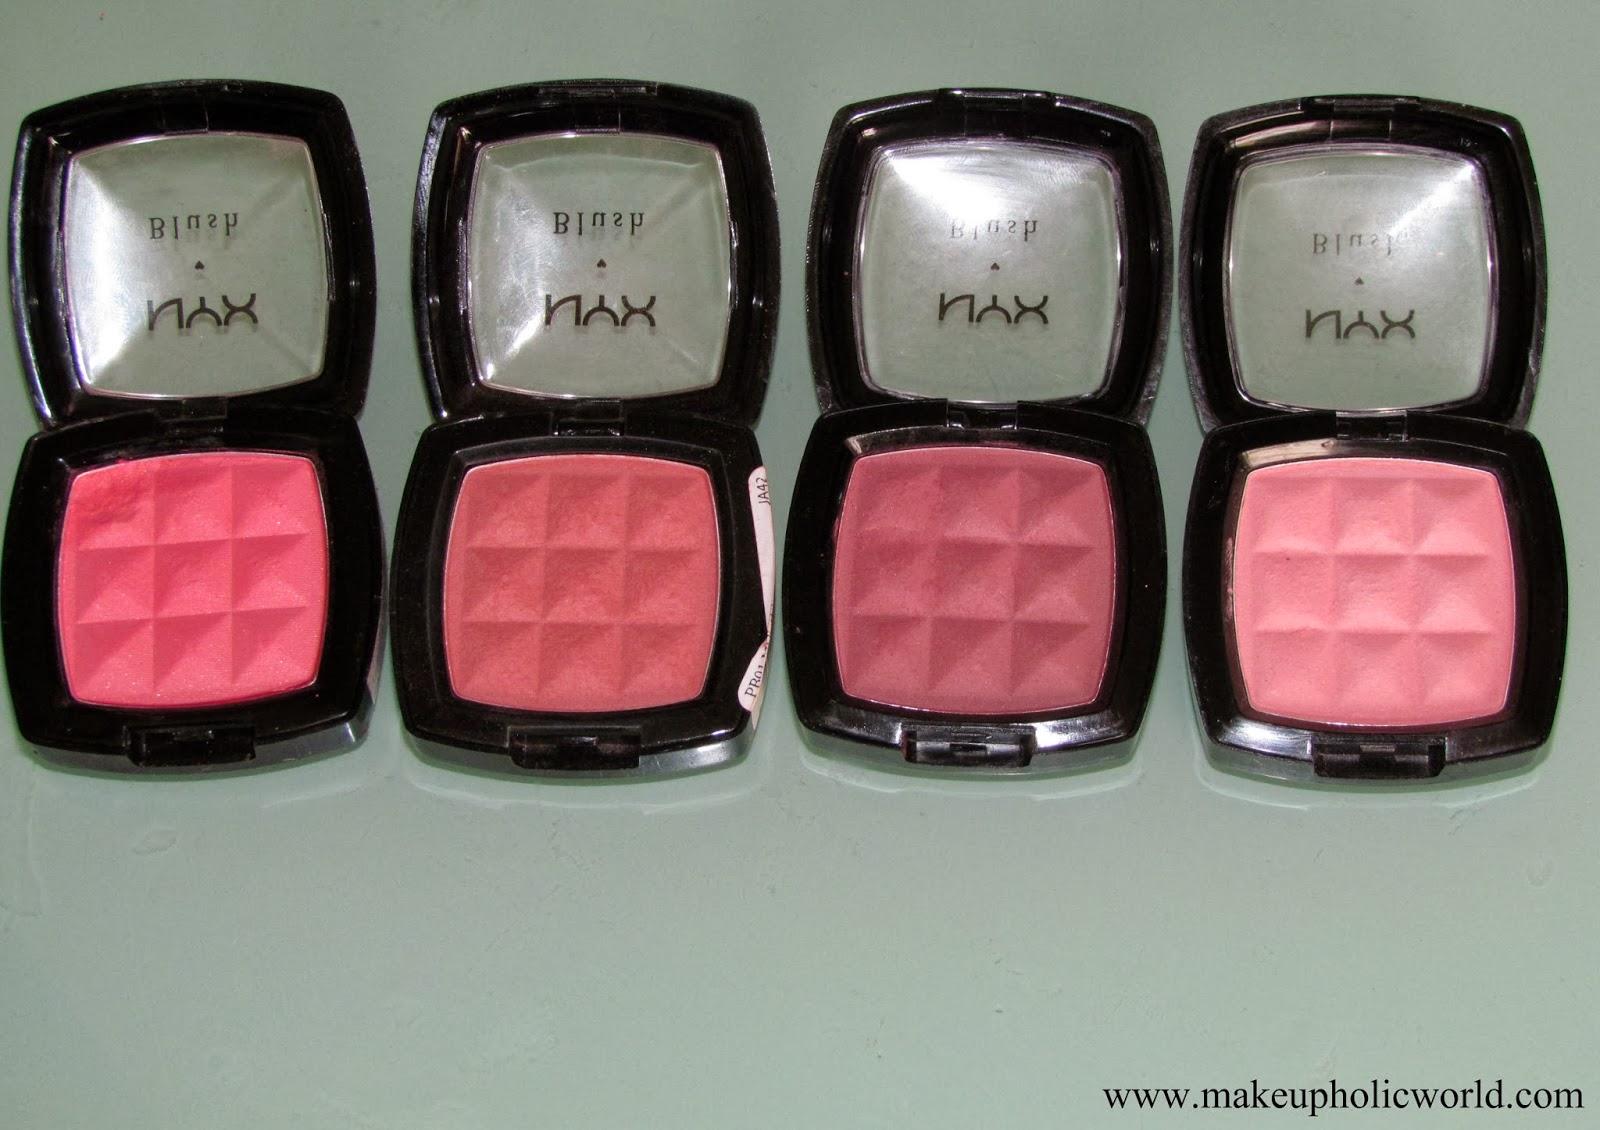 NYX Blush- Rose Garden, Mocha, Silky Rose, Peach